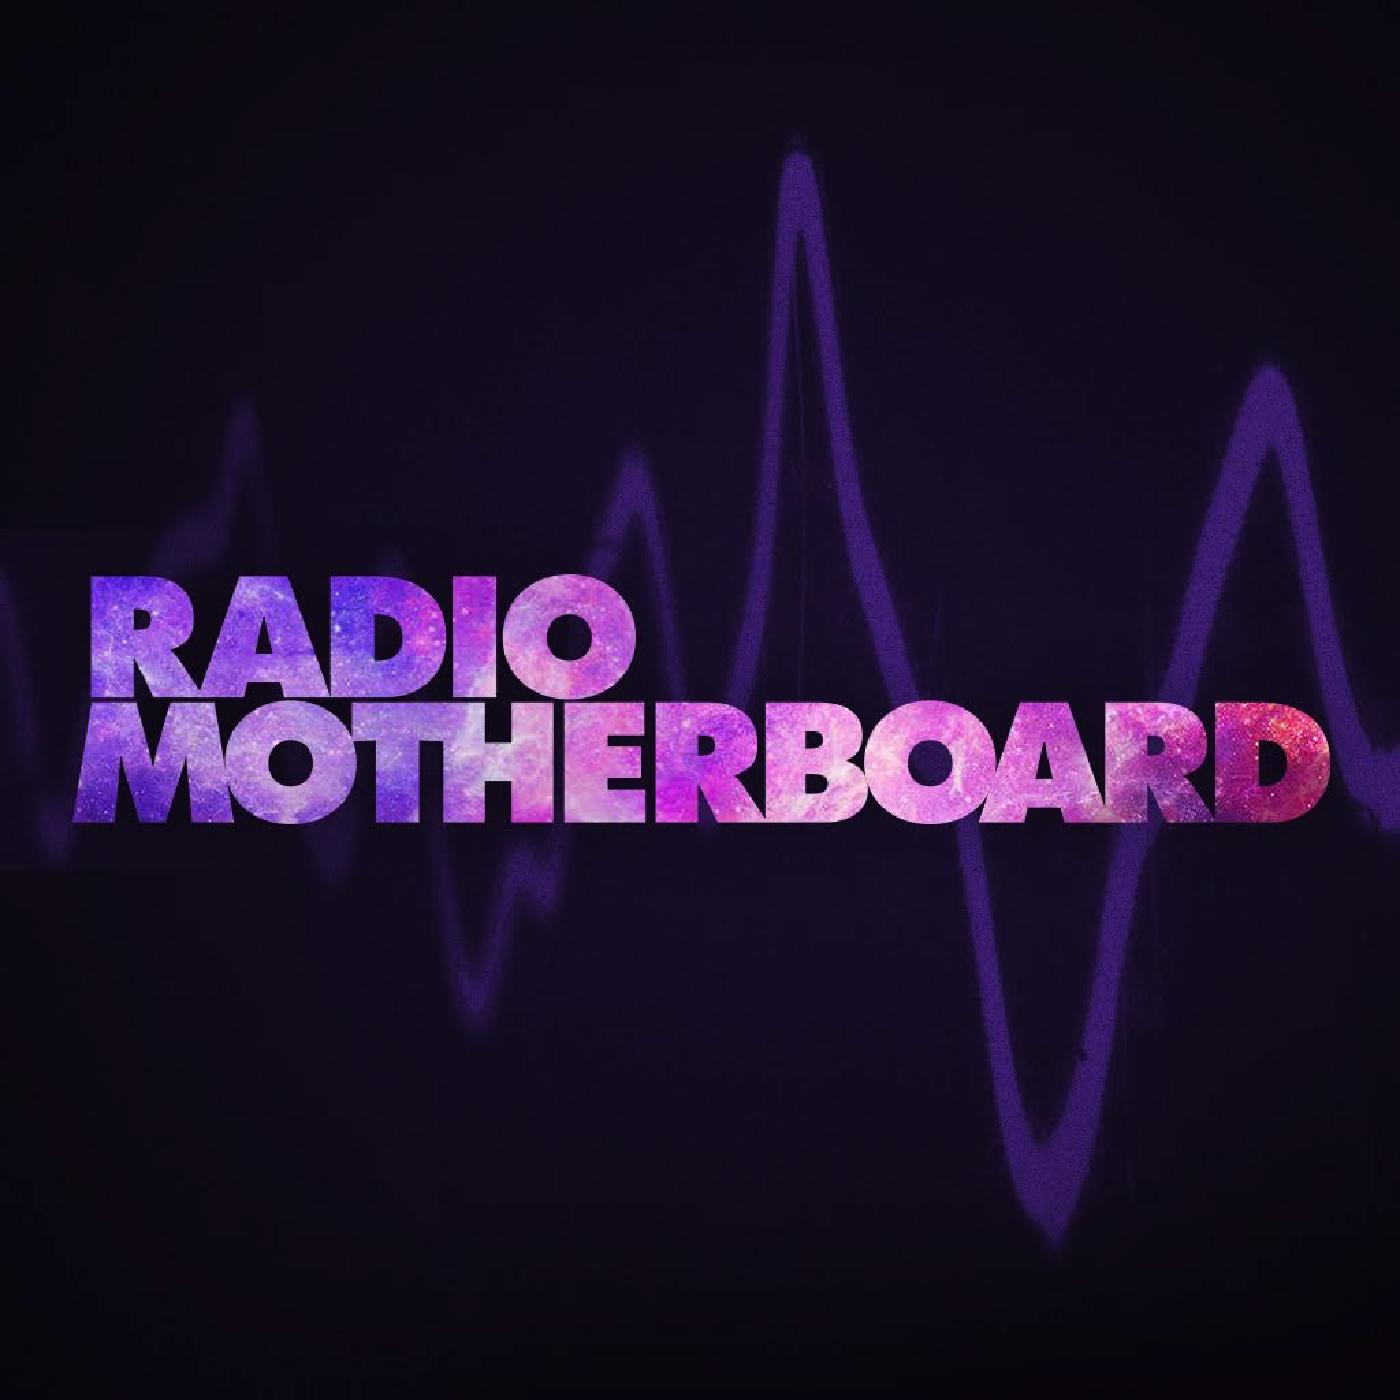 Radio Motherboard